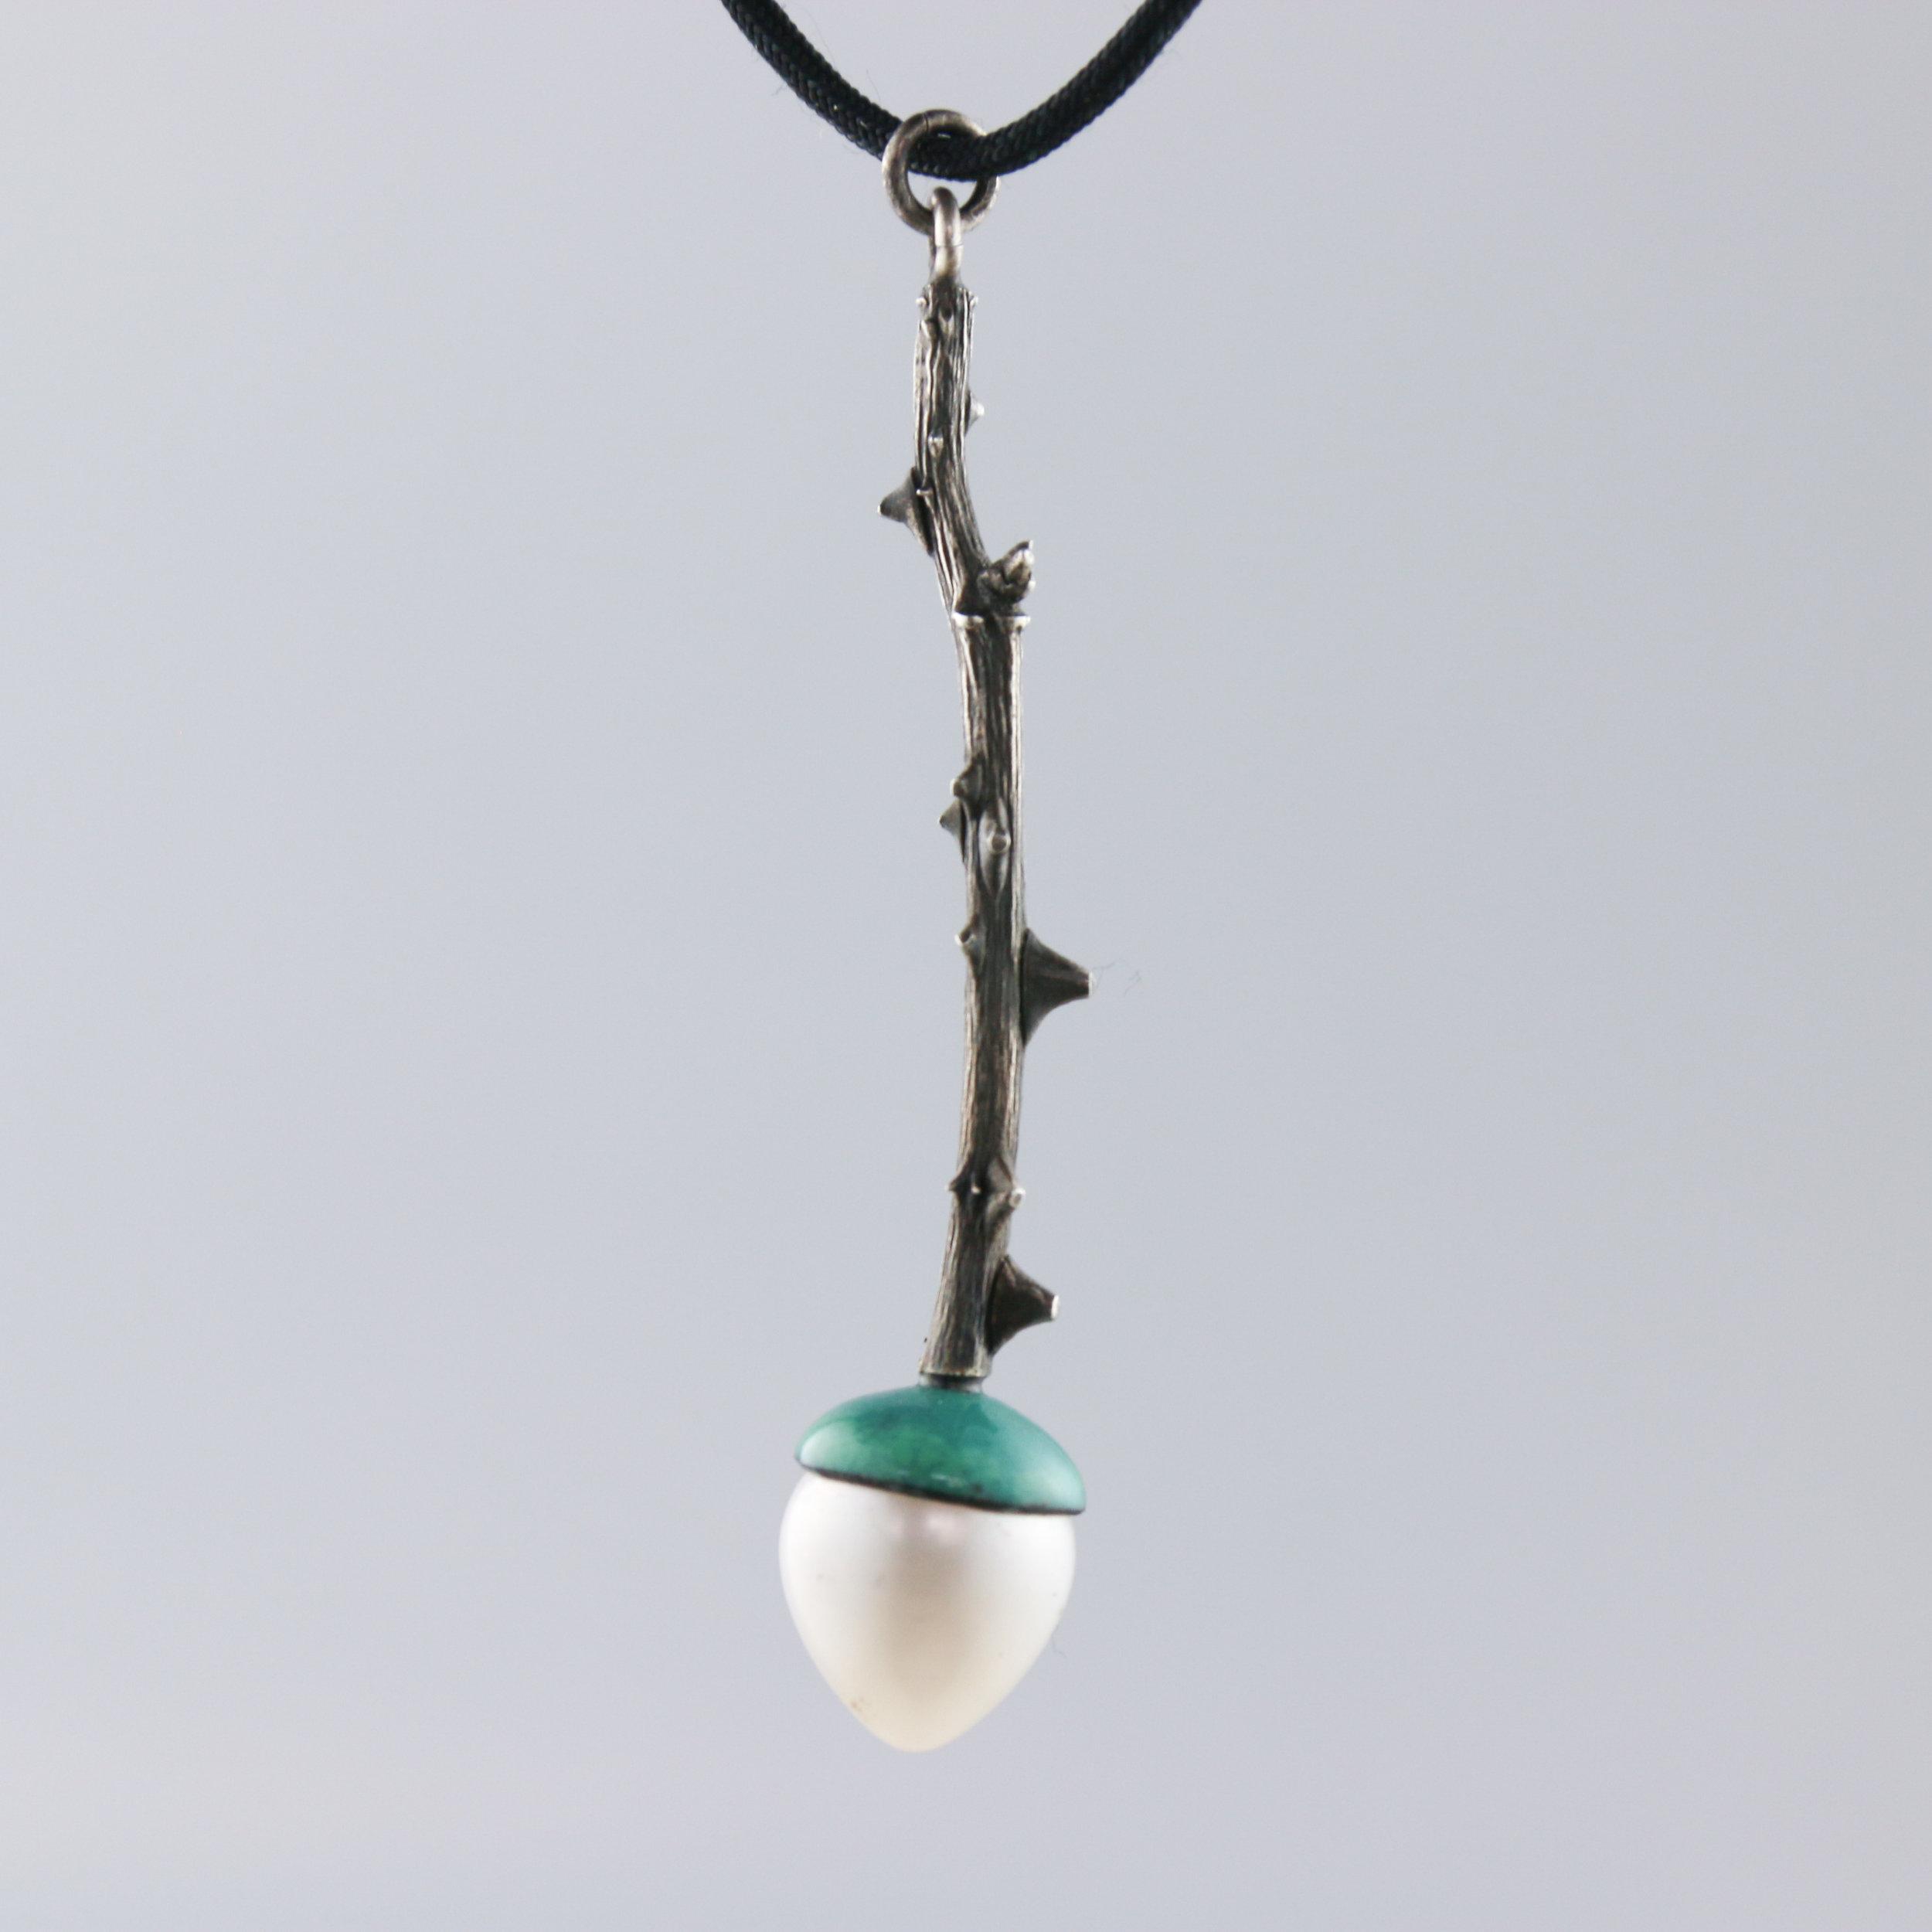 Pendant   sterling silver, pearls, enamel